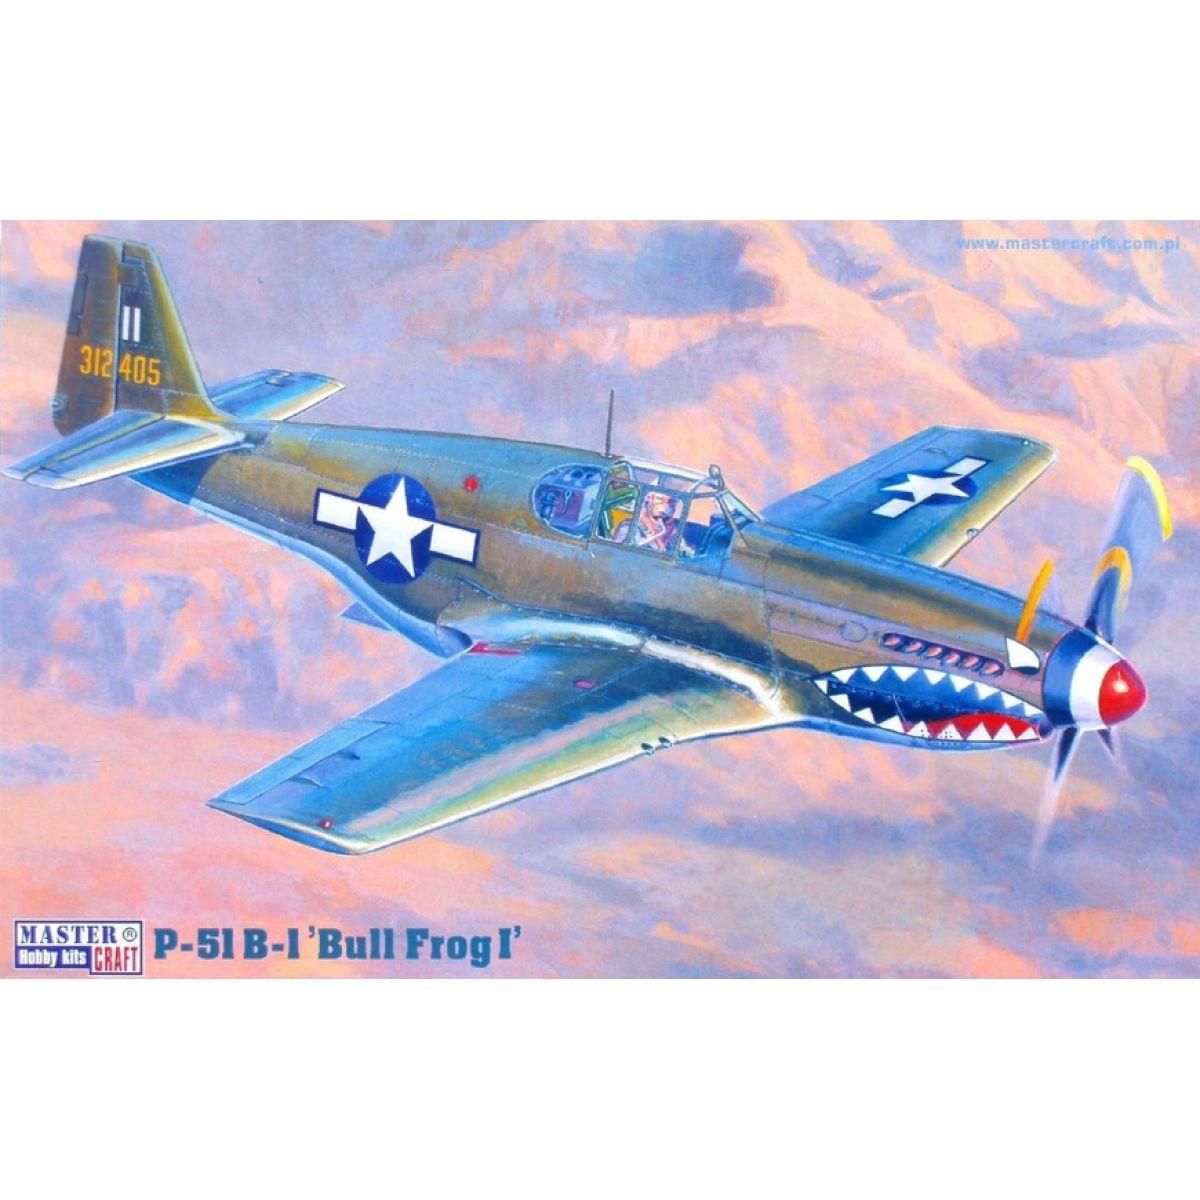 Master Craft Bojový letoun P-51B-1 Mustang Bullfrog - Série III